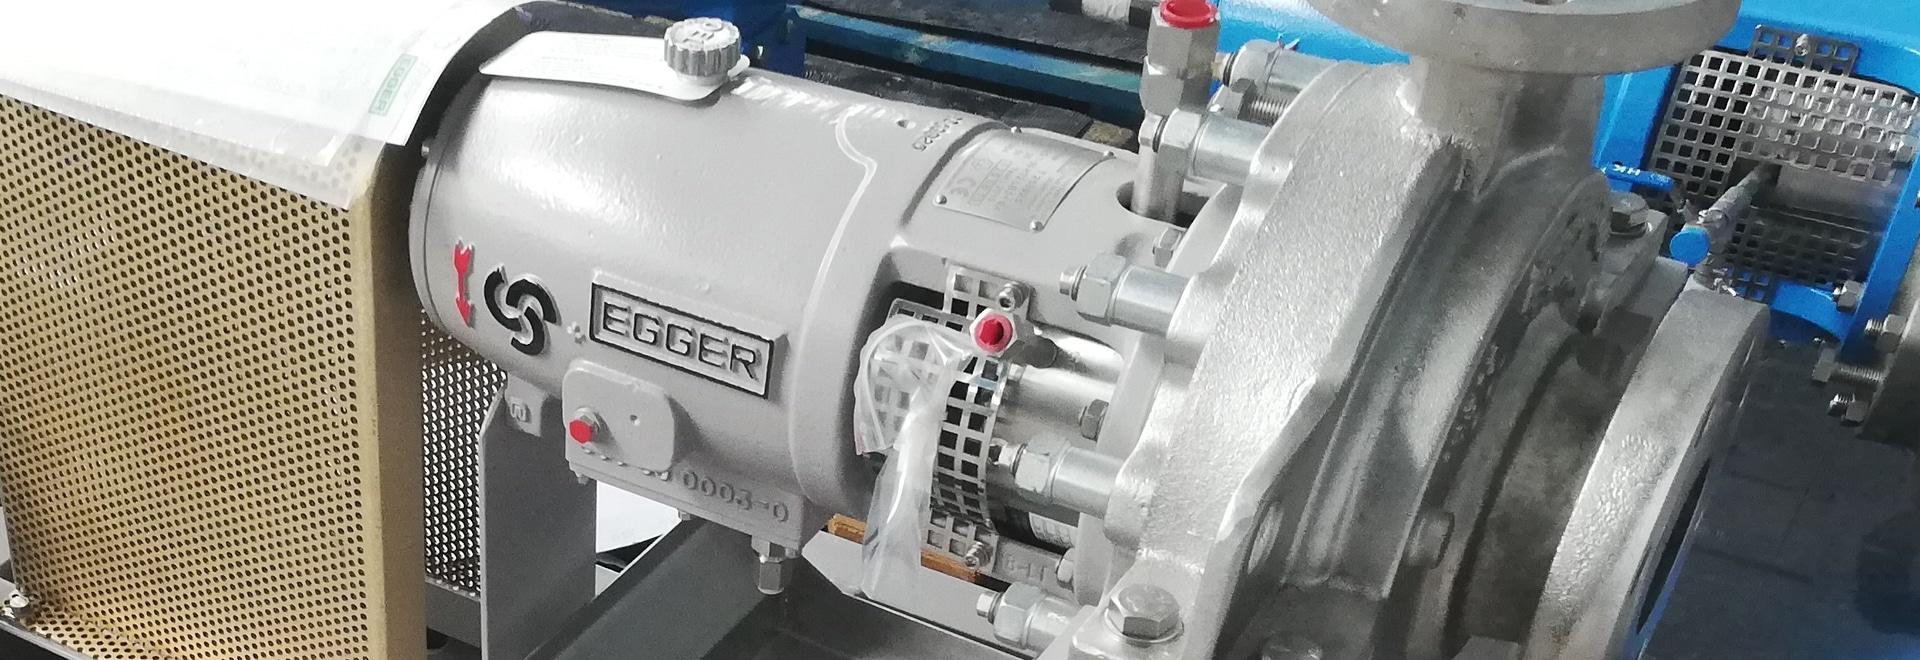 Egger Reactor pump for Eastman, USA